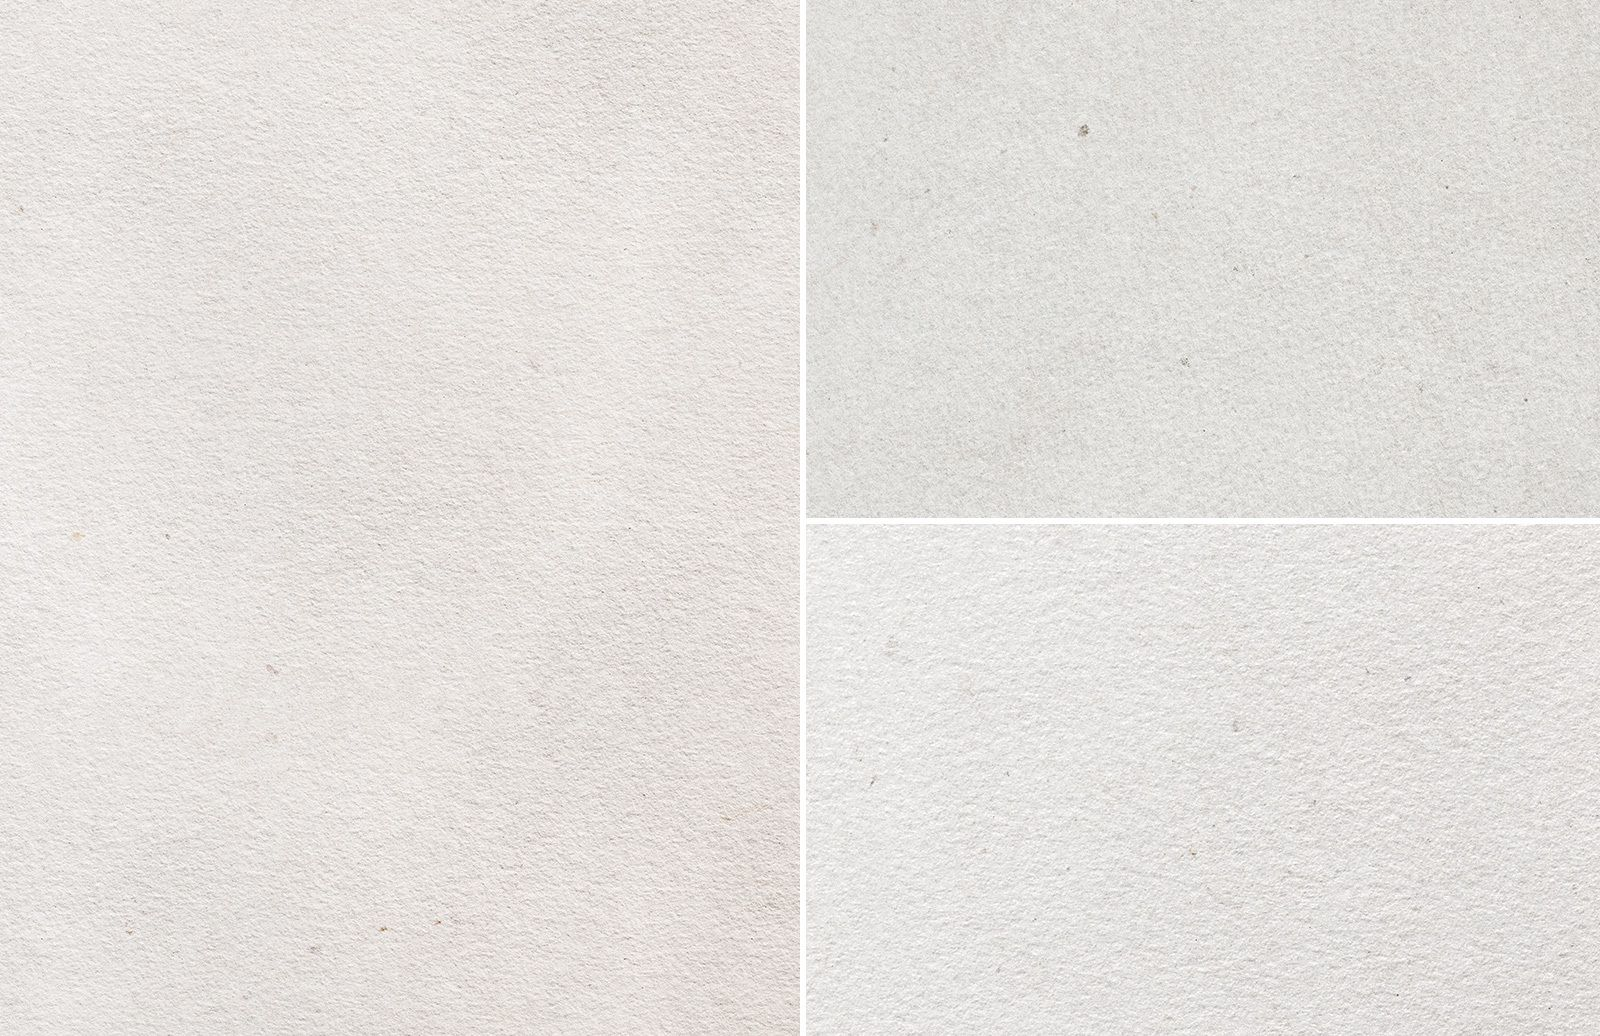 Paper Texture Set Preview 1